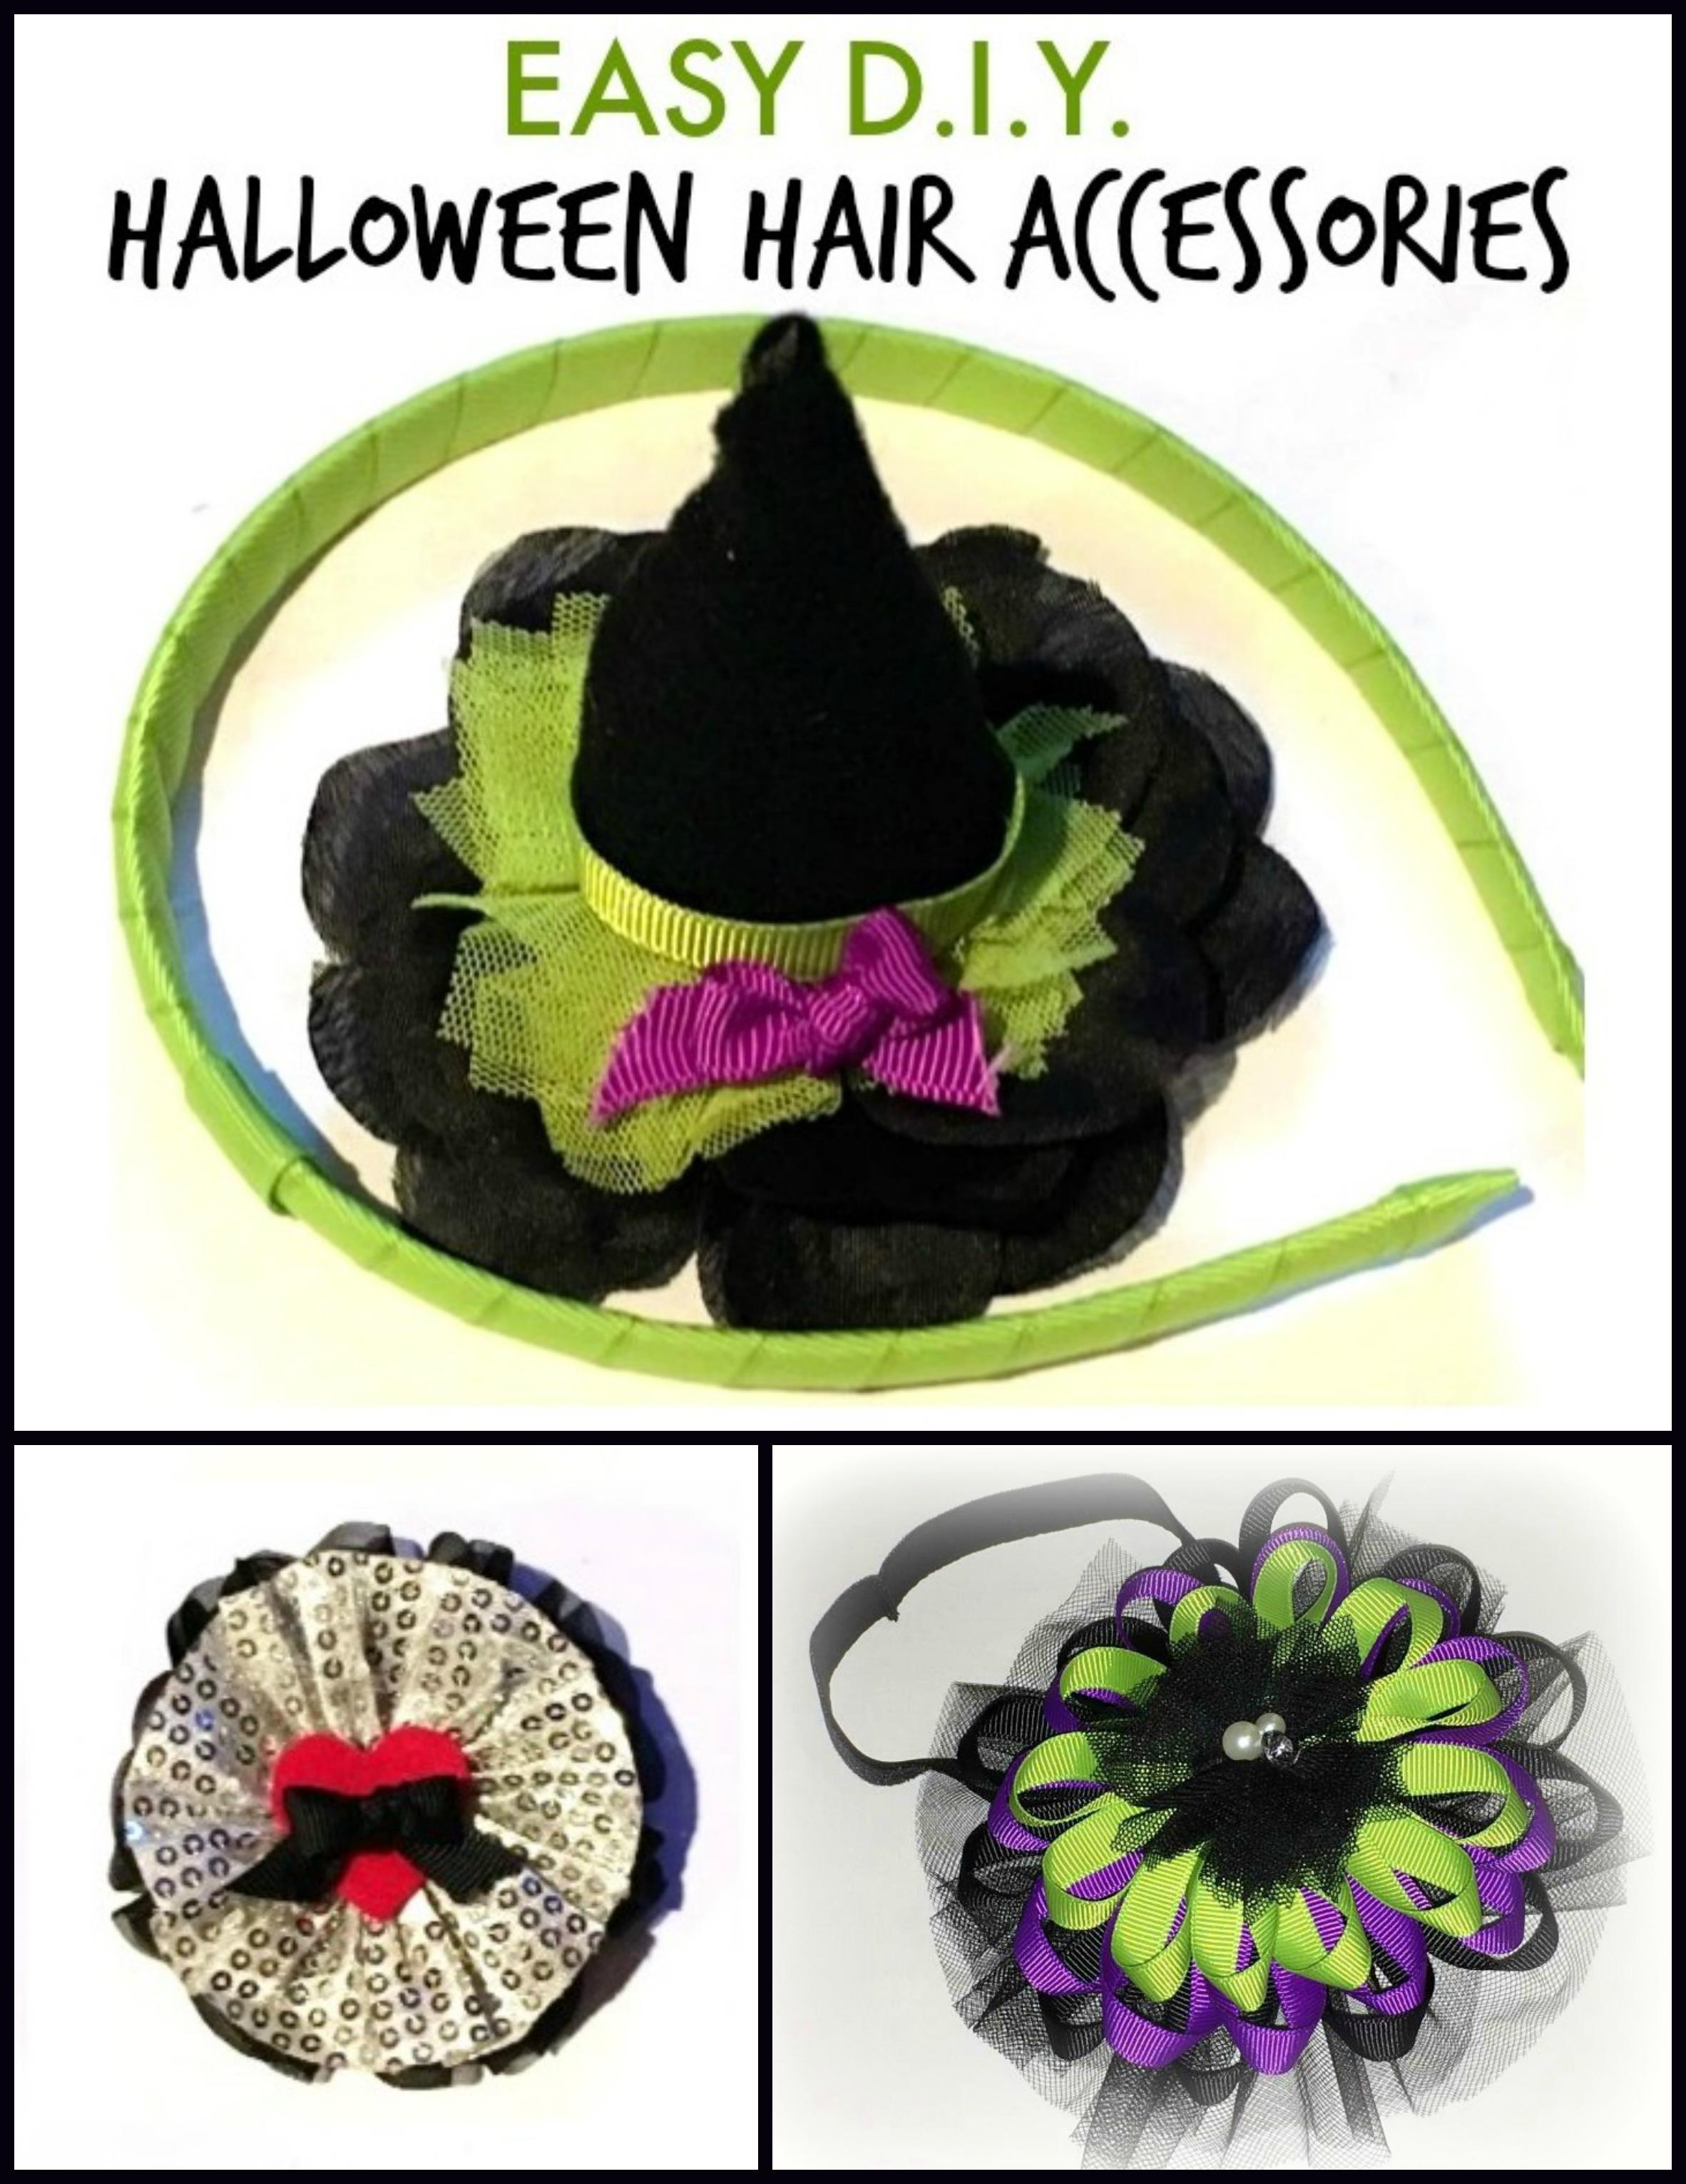 9269b0c9423a5e Halloween Hair Accessories   3 Easy Crafting Tutorials by The Hair Bow Co.